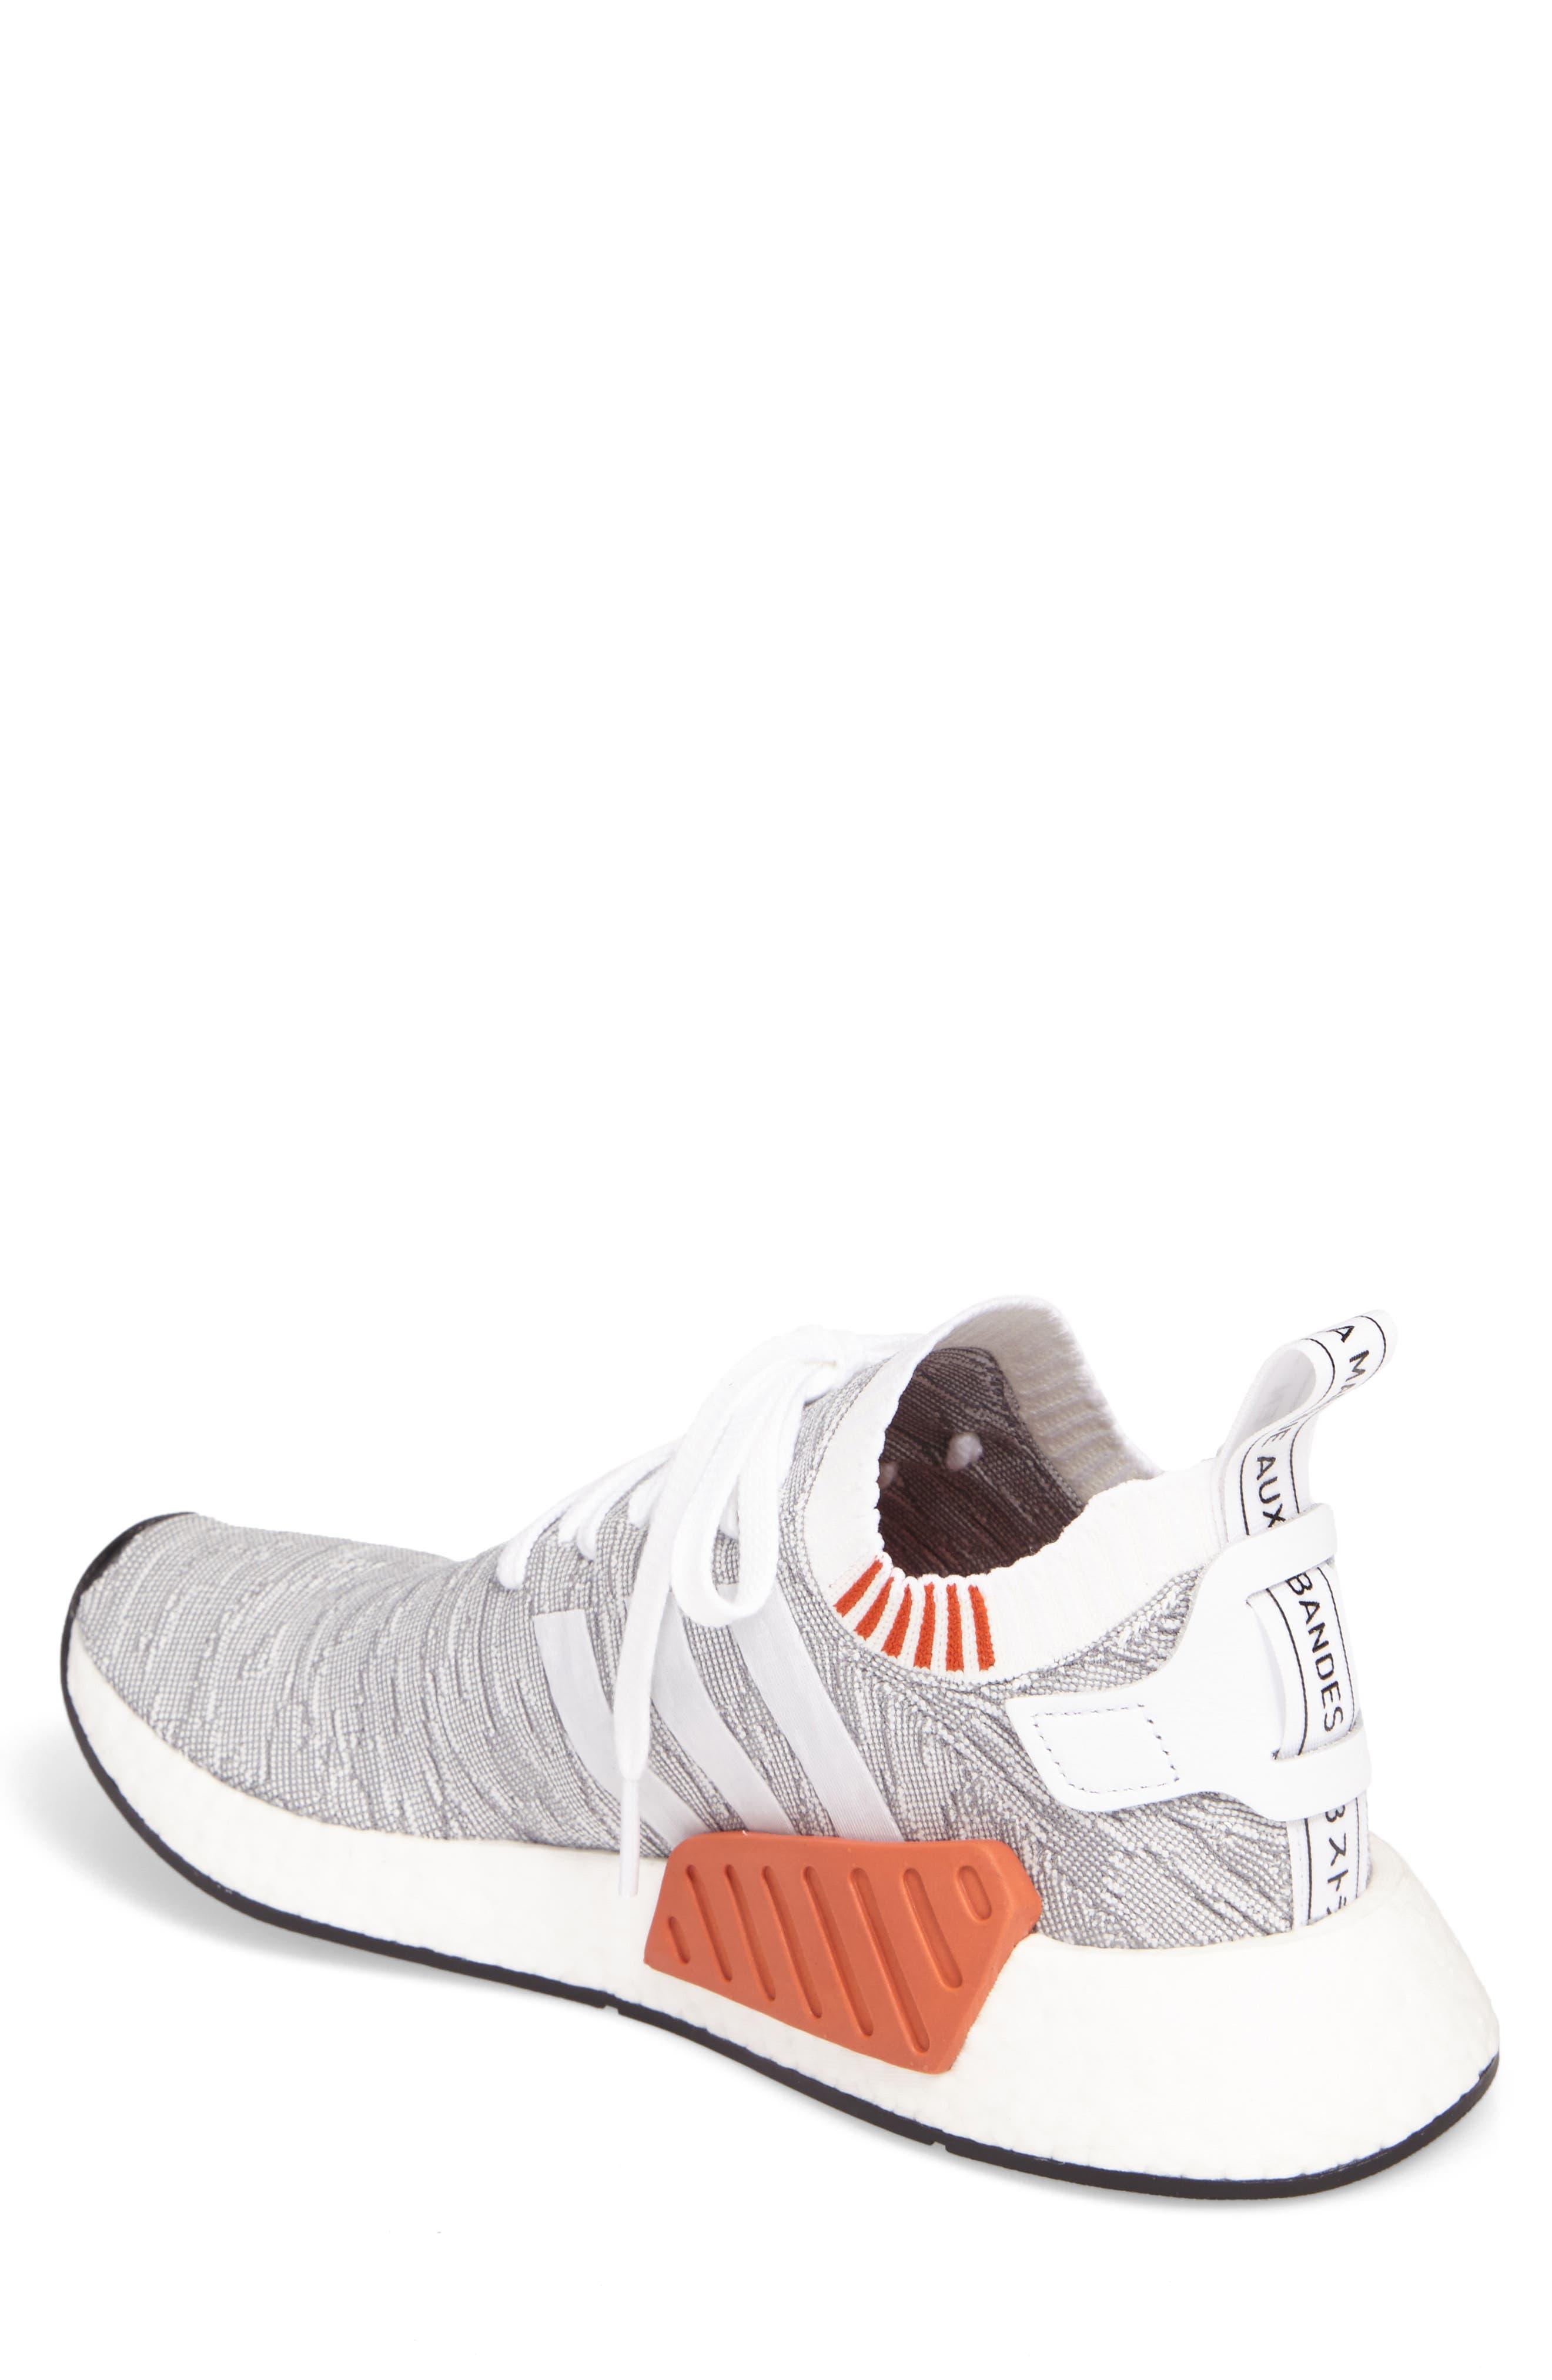 NMD R2 Primeknit Running Shoe,                             Alternate thumbnail 4, color,